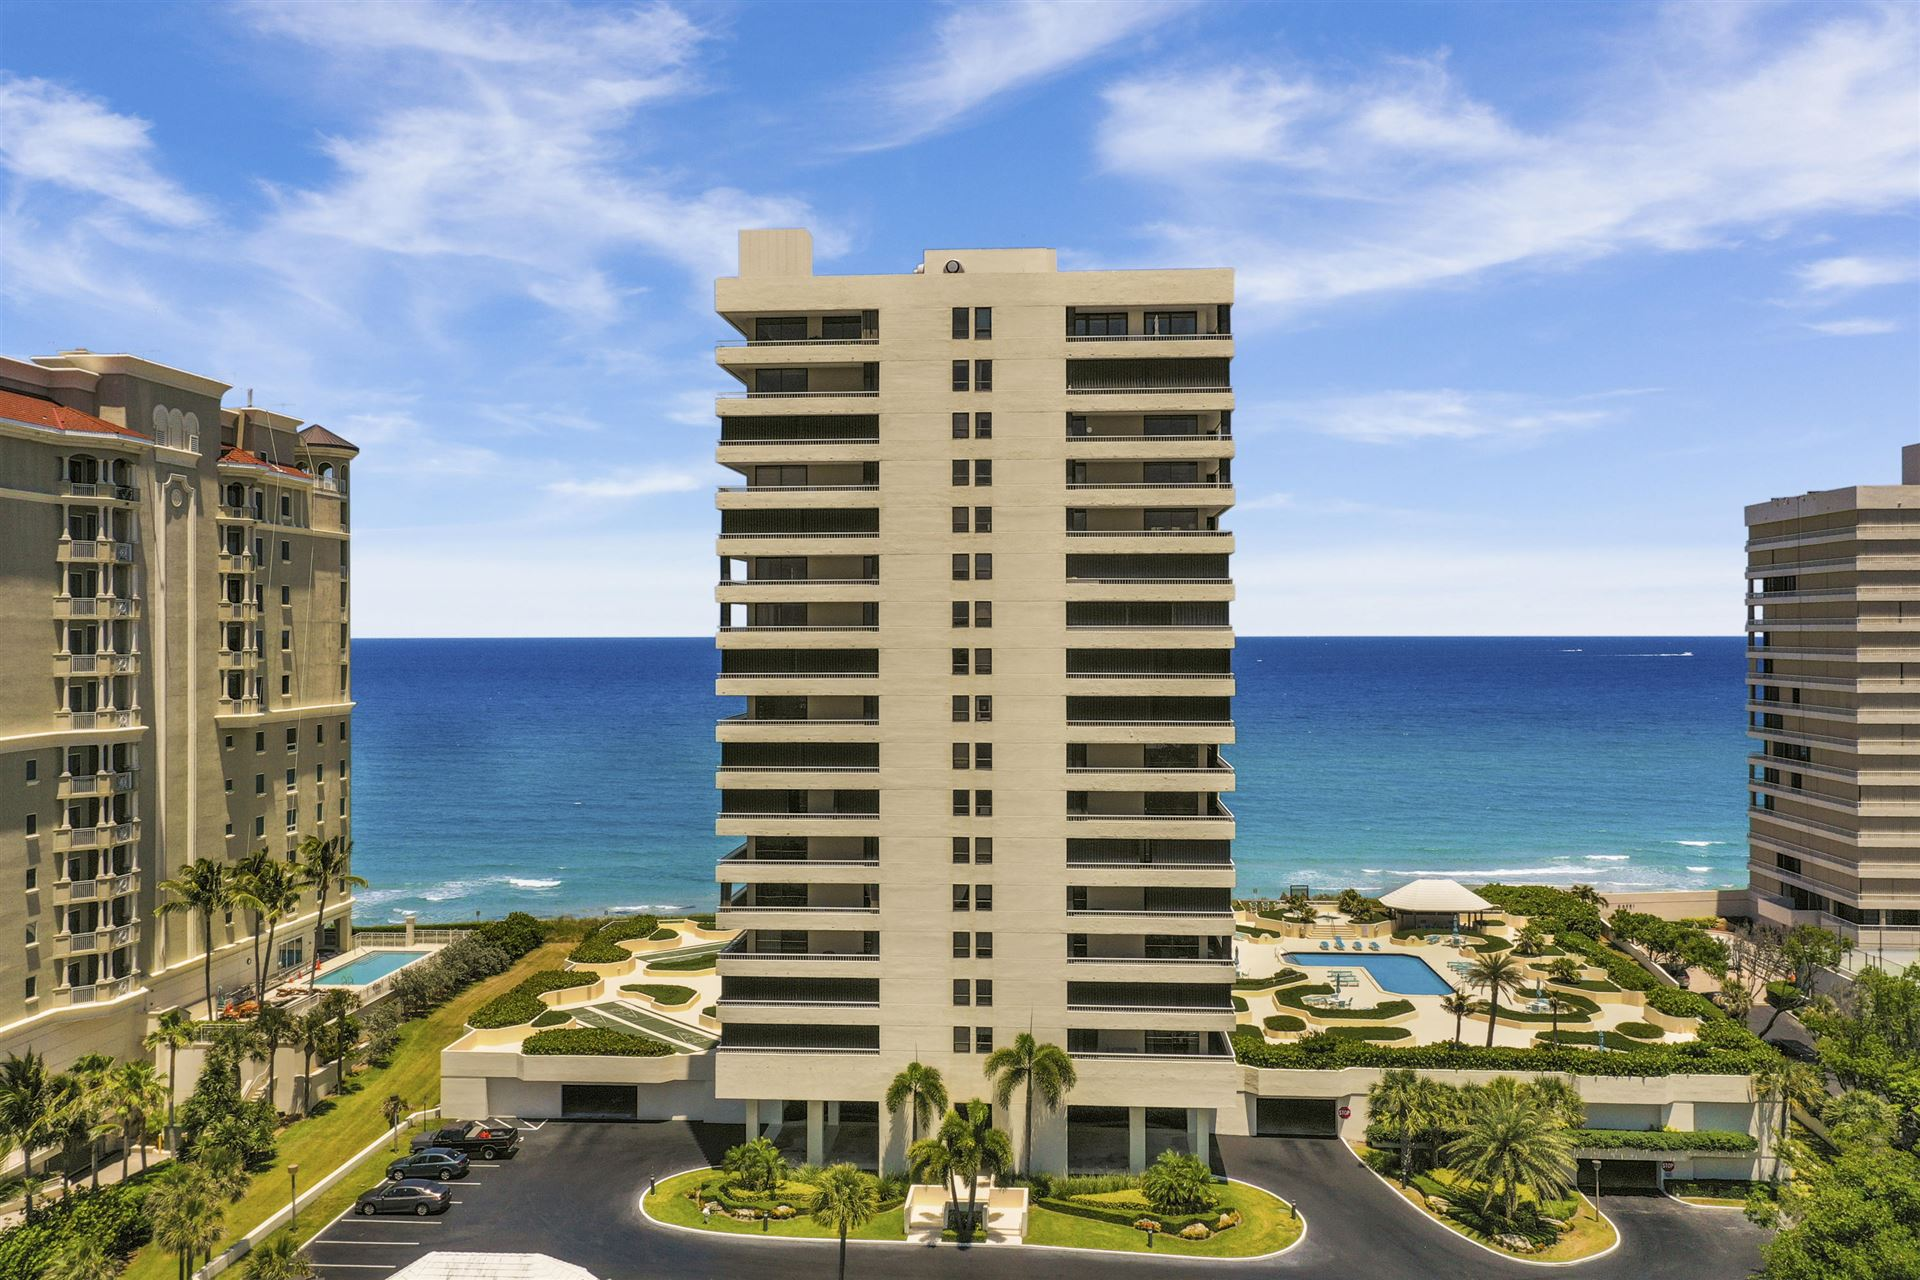 Photo of 5280 N Ocean Drive #4e, Singer Island, FL 33404 (MLS # RX-10659038)